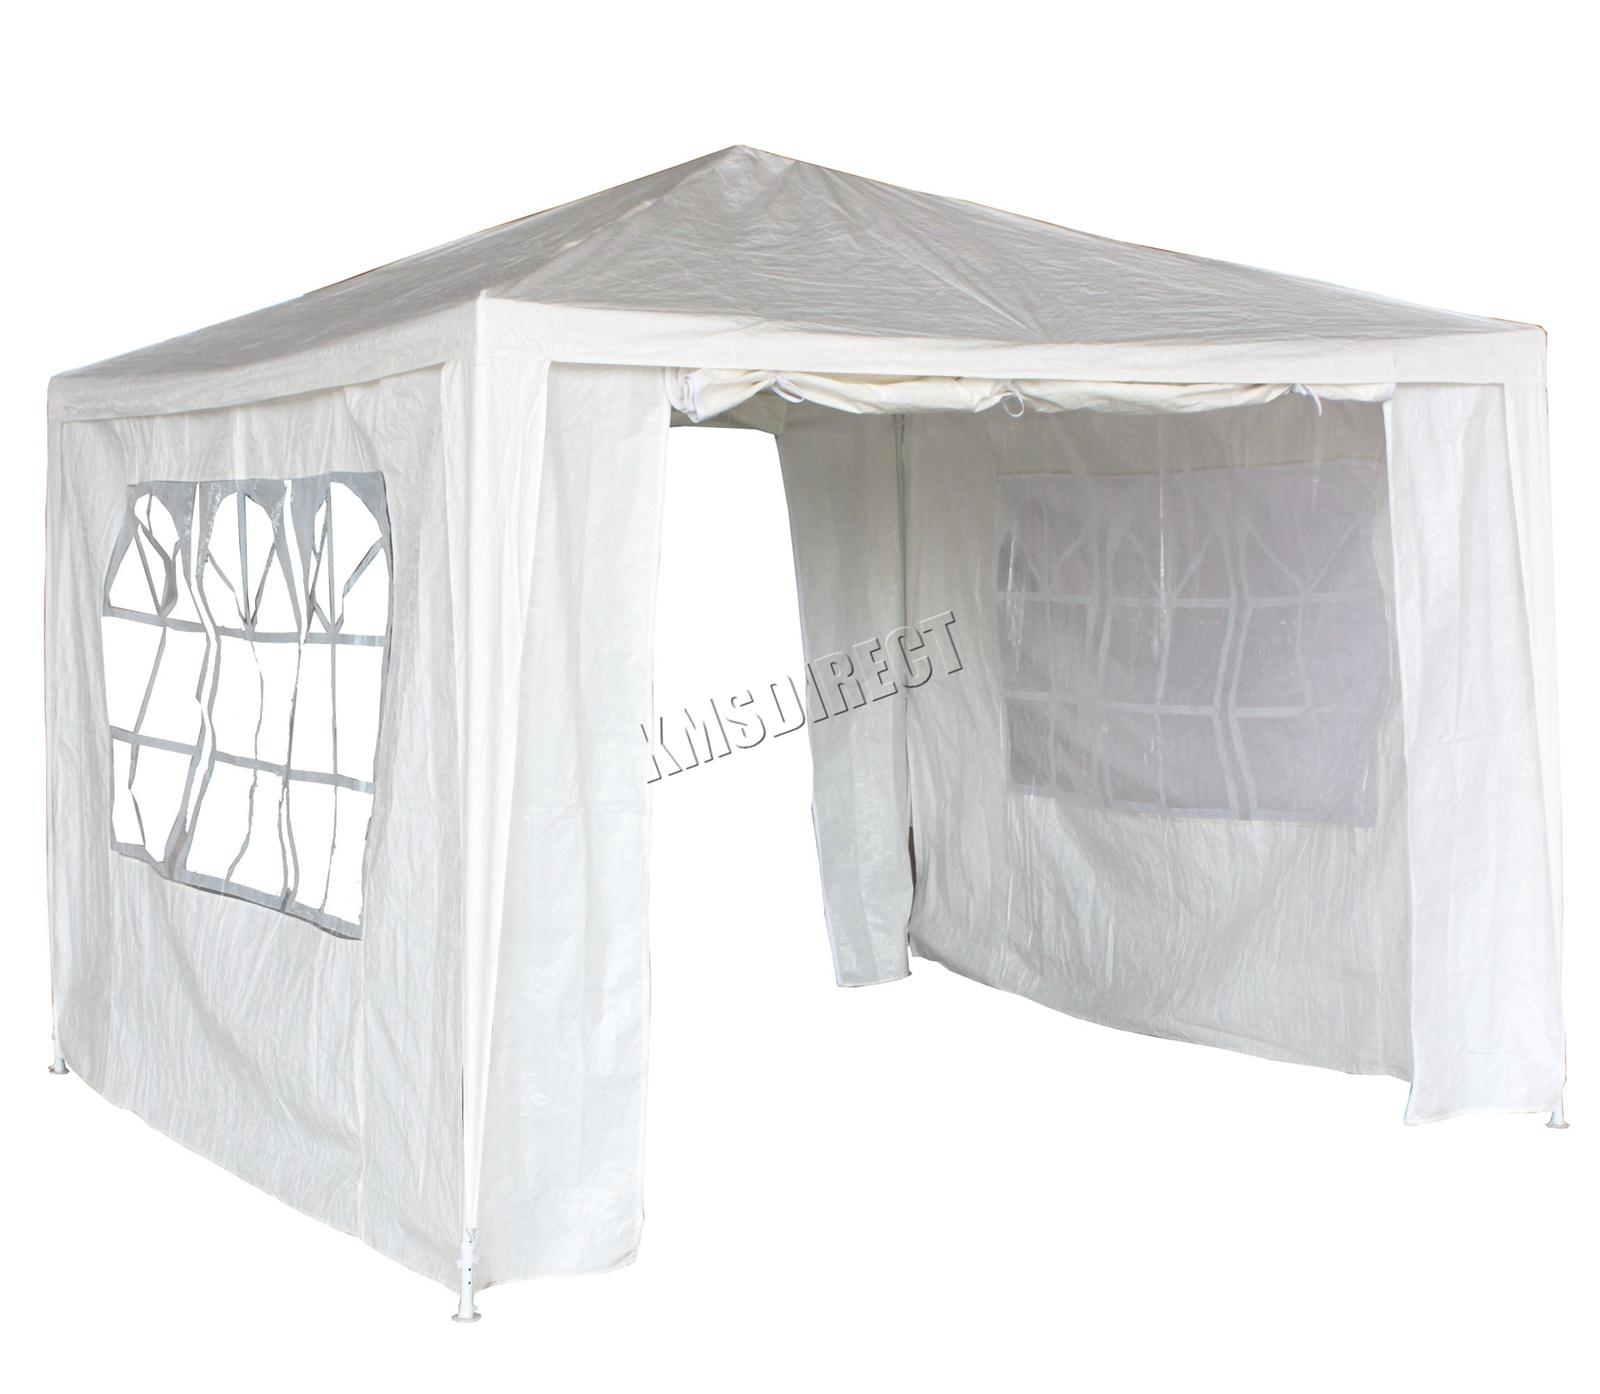 New-3-x-3m-120g-Waterproof-Outdoor-PE-Garden-Gazebo-Marquee-Canopy-Party-Tent Indexbild 27